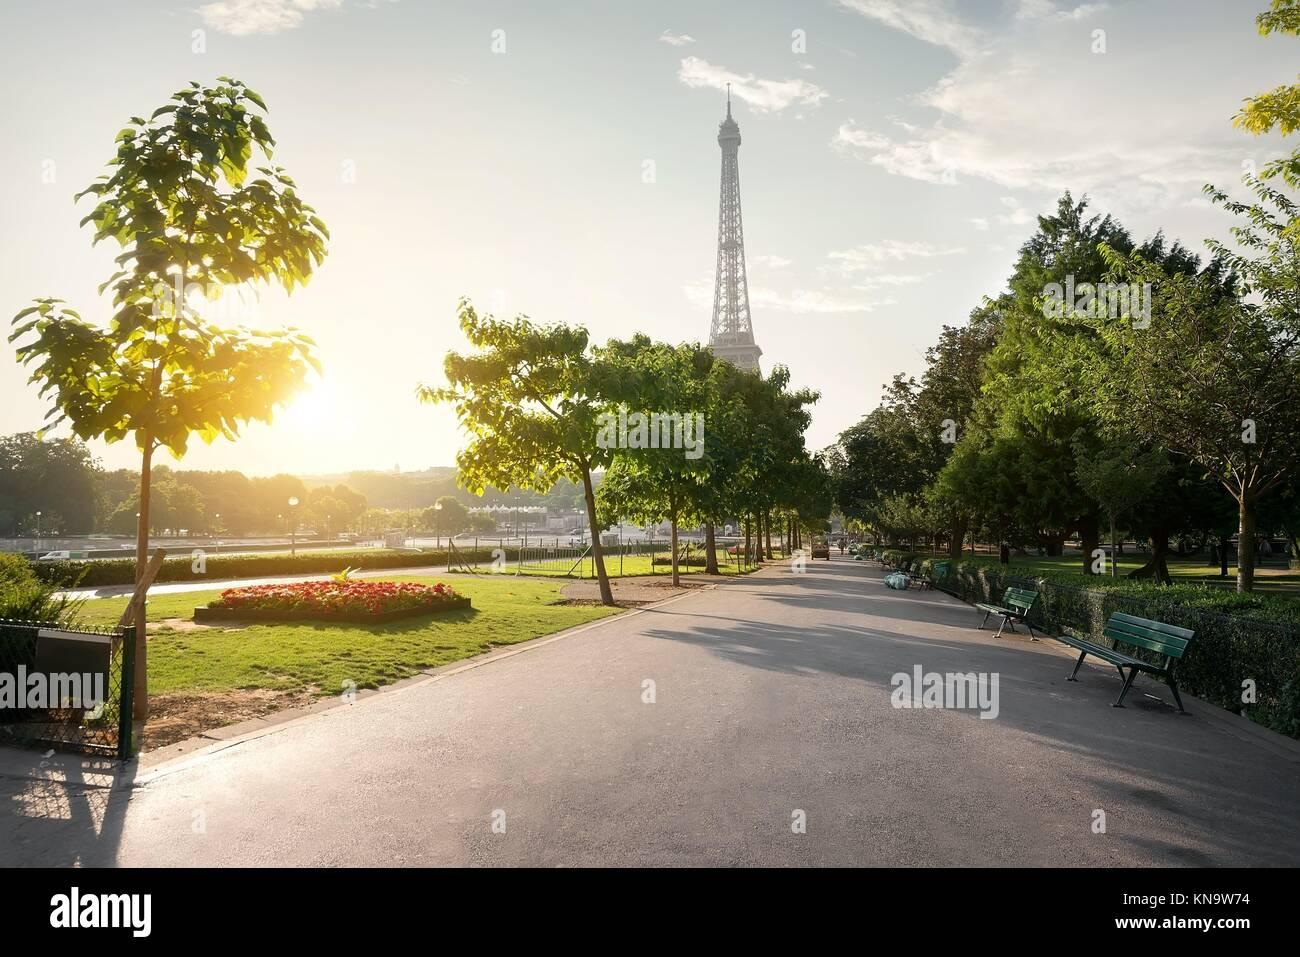 Calm morning in Trocadero Gardens in Paris, France. - Stock Image